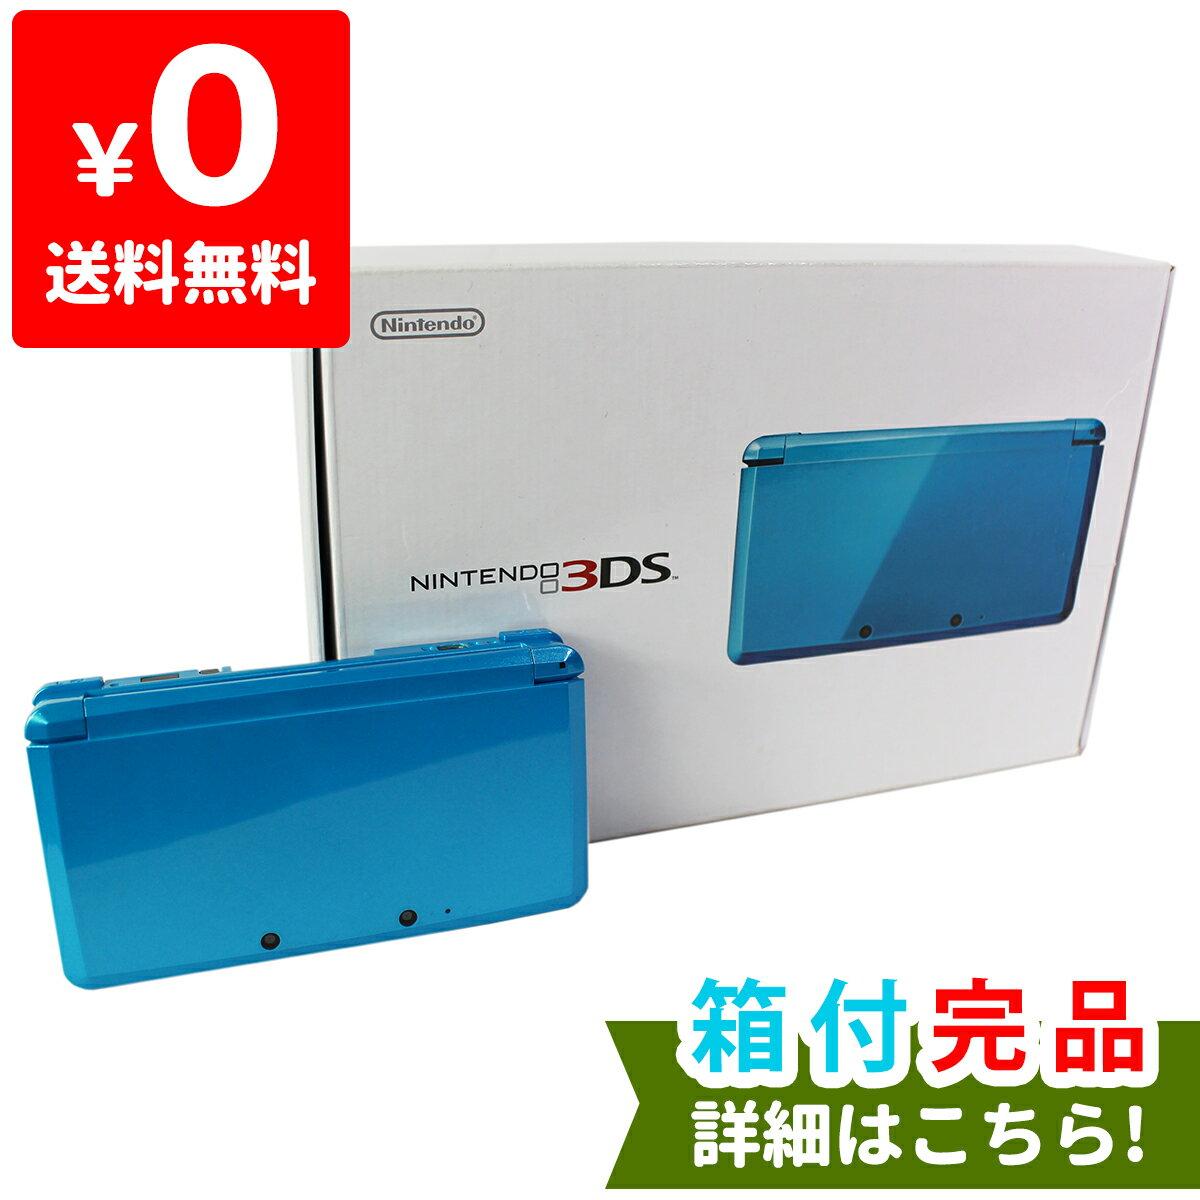 3DS ニンテンドー3DS ライトブルー(CTR-S-BDBA) 本体 完品 外箱付き Nintendo 任天堂 ニンテンドー 中古 4902370520514 送料無料 【中古】